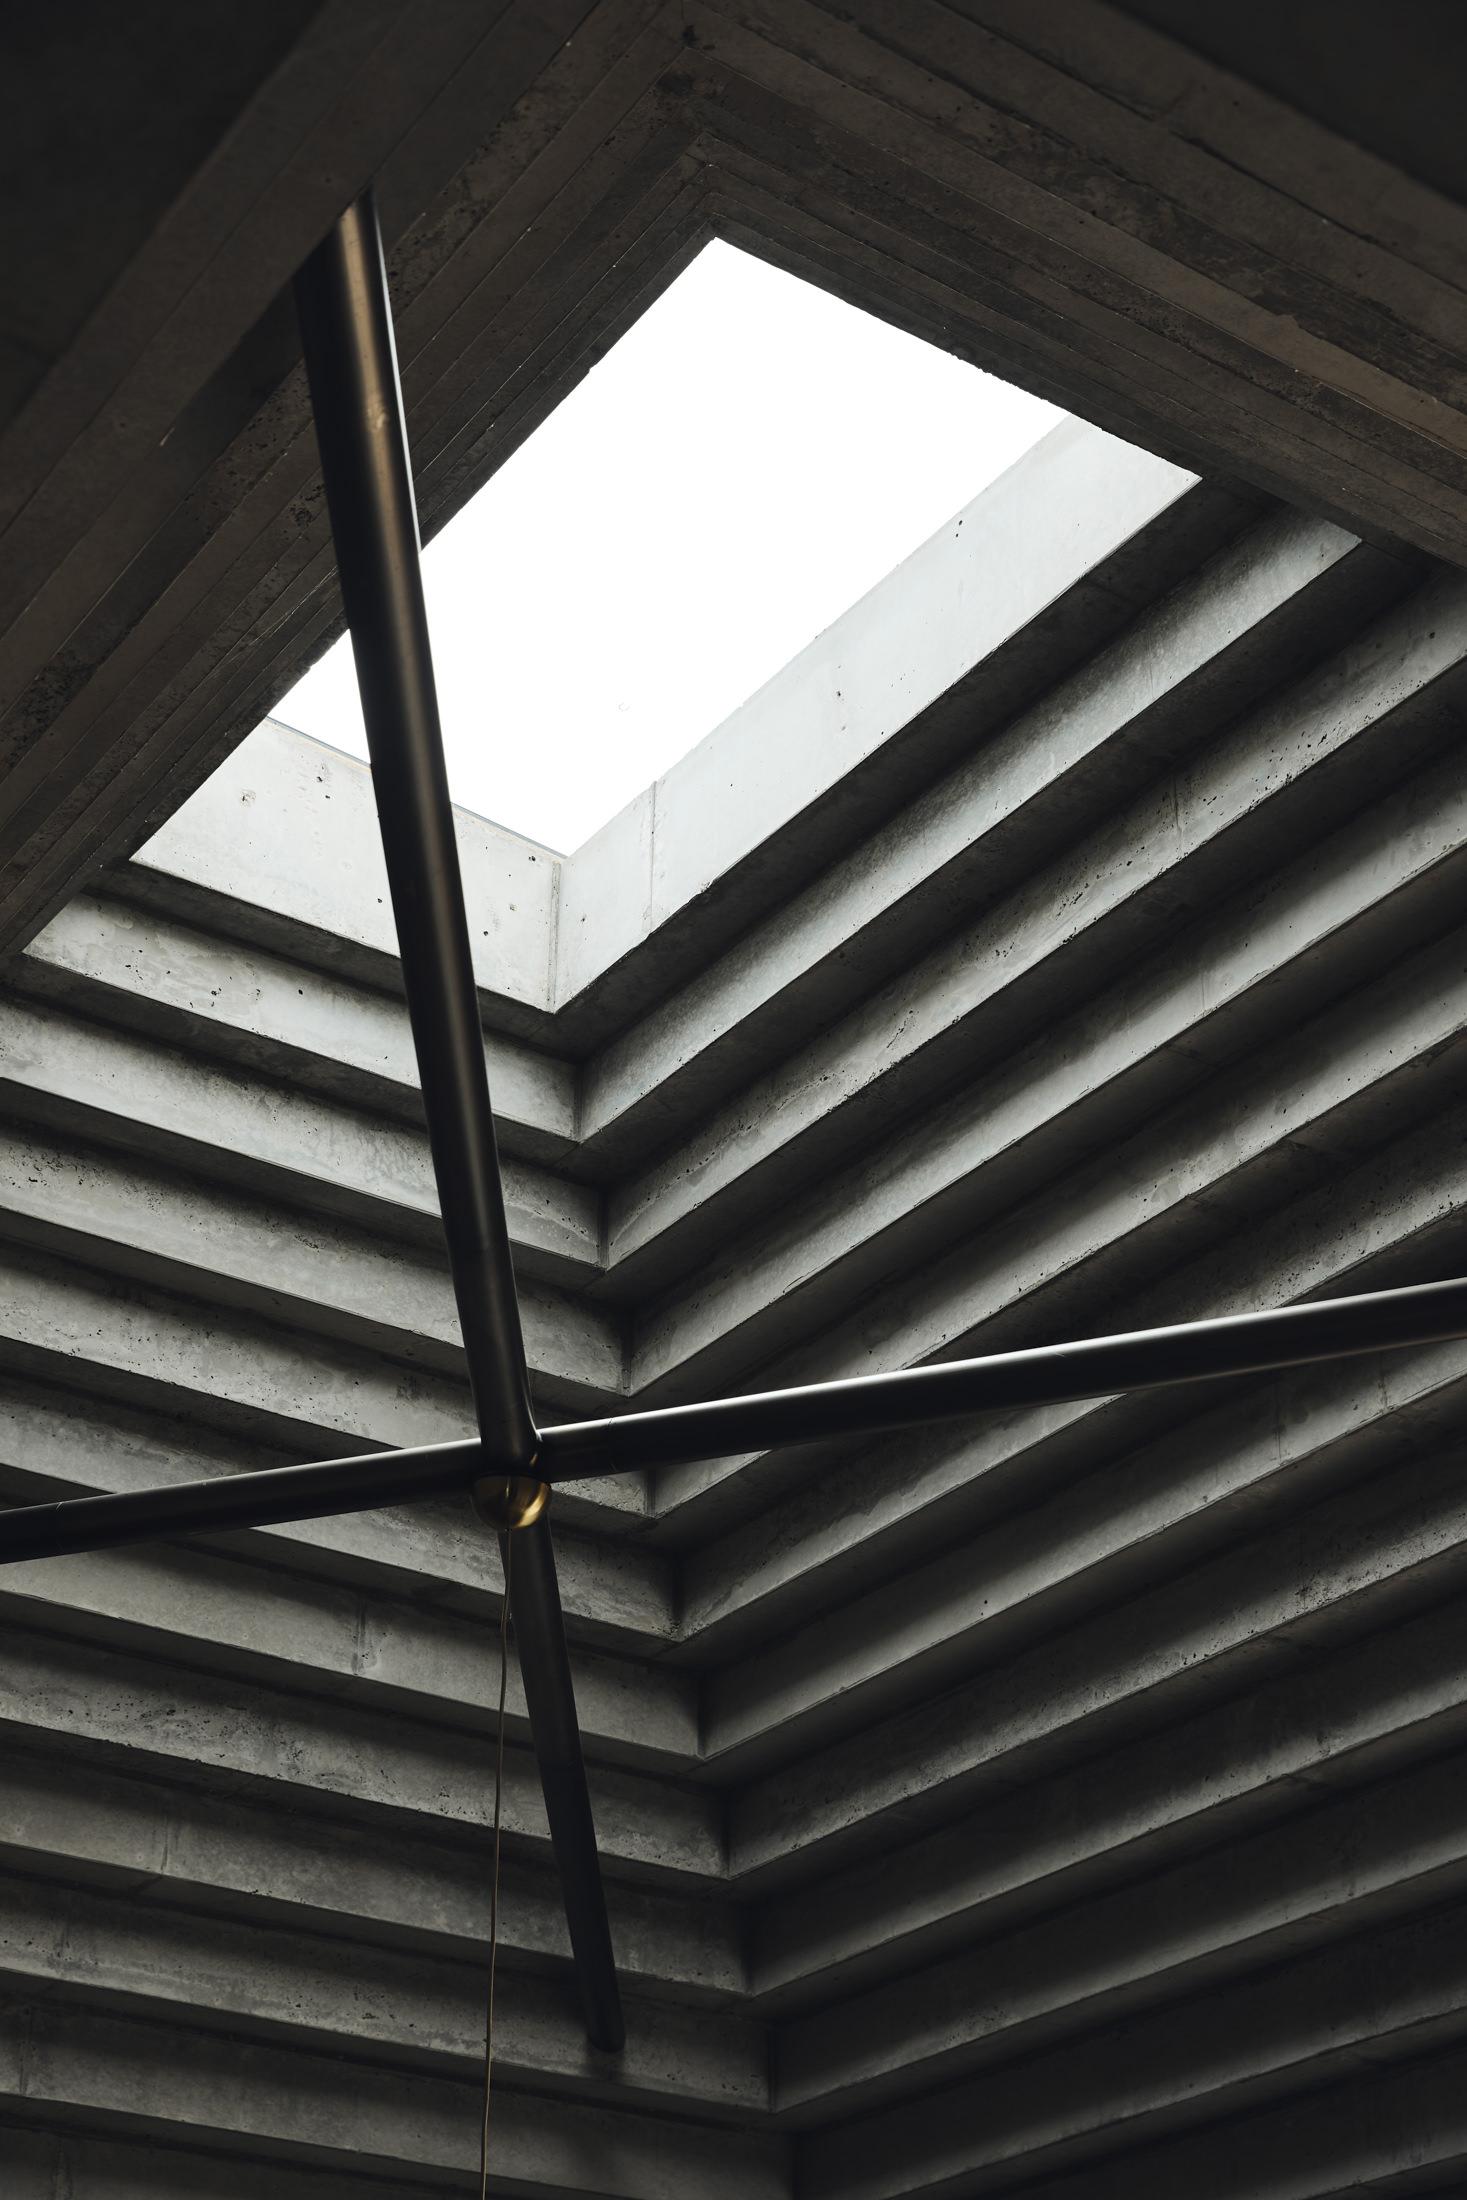 Architects Eat Bellows Beach House Flinders Masonry Architecture Photo Derek Swalwell Yellowtrace 21